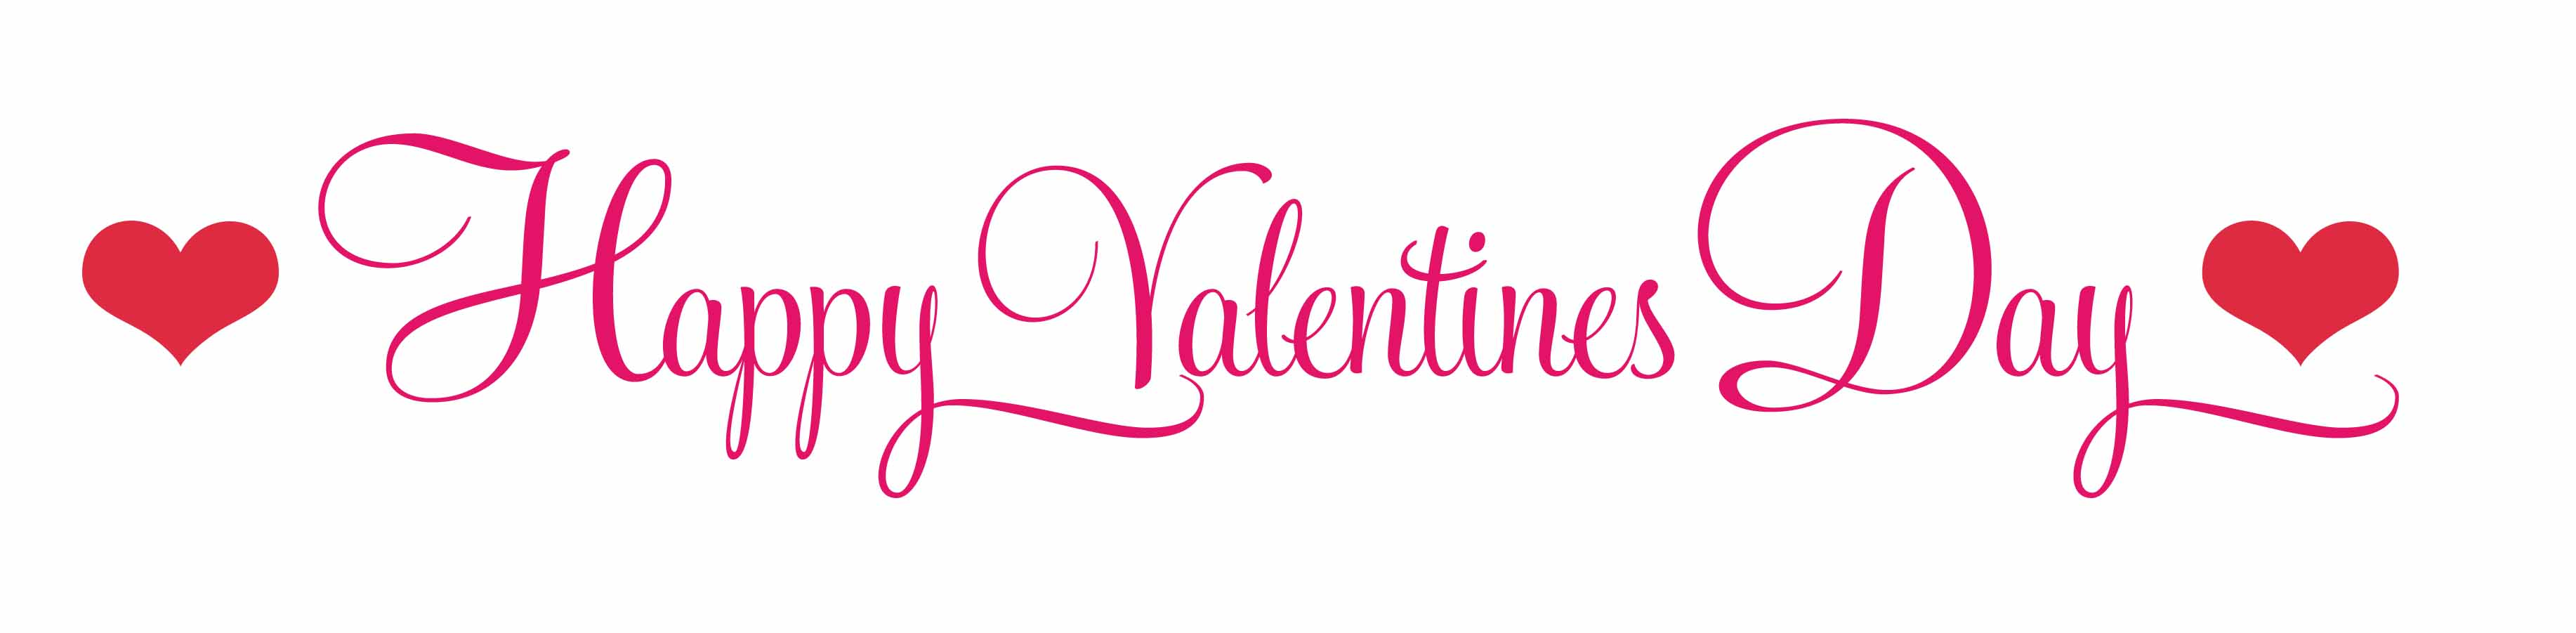 Happy-Valentines-Day fancy-1.jpg